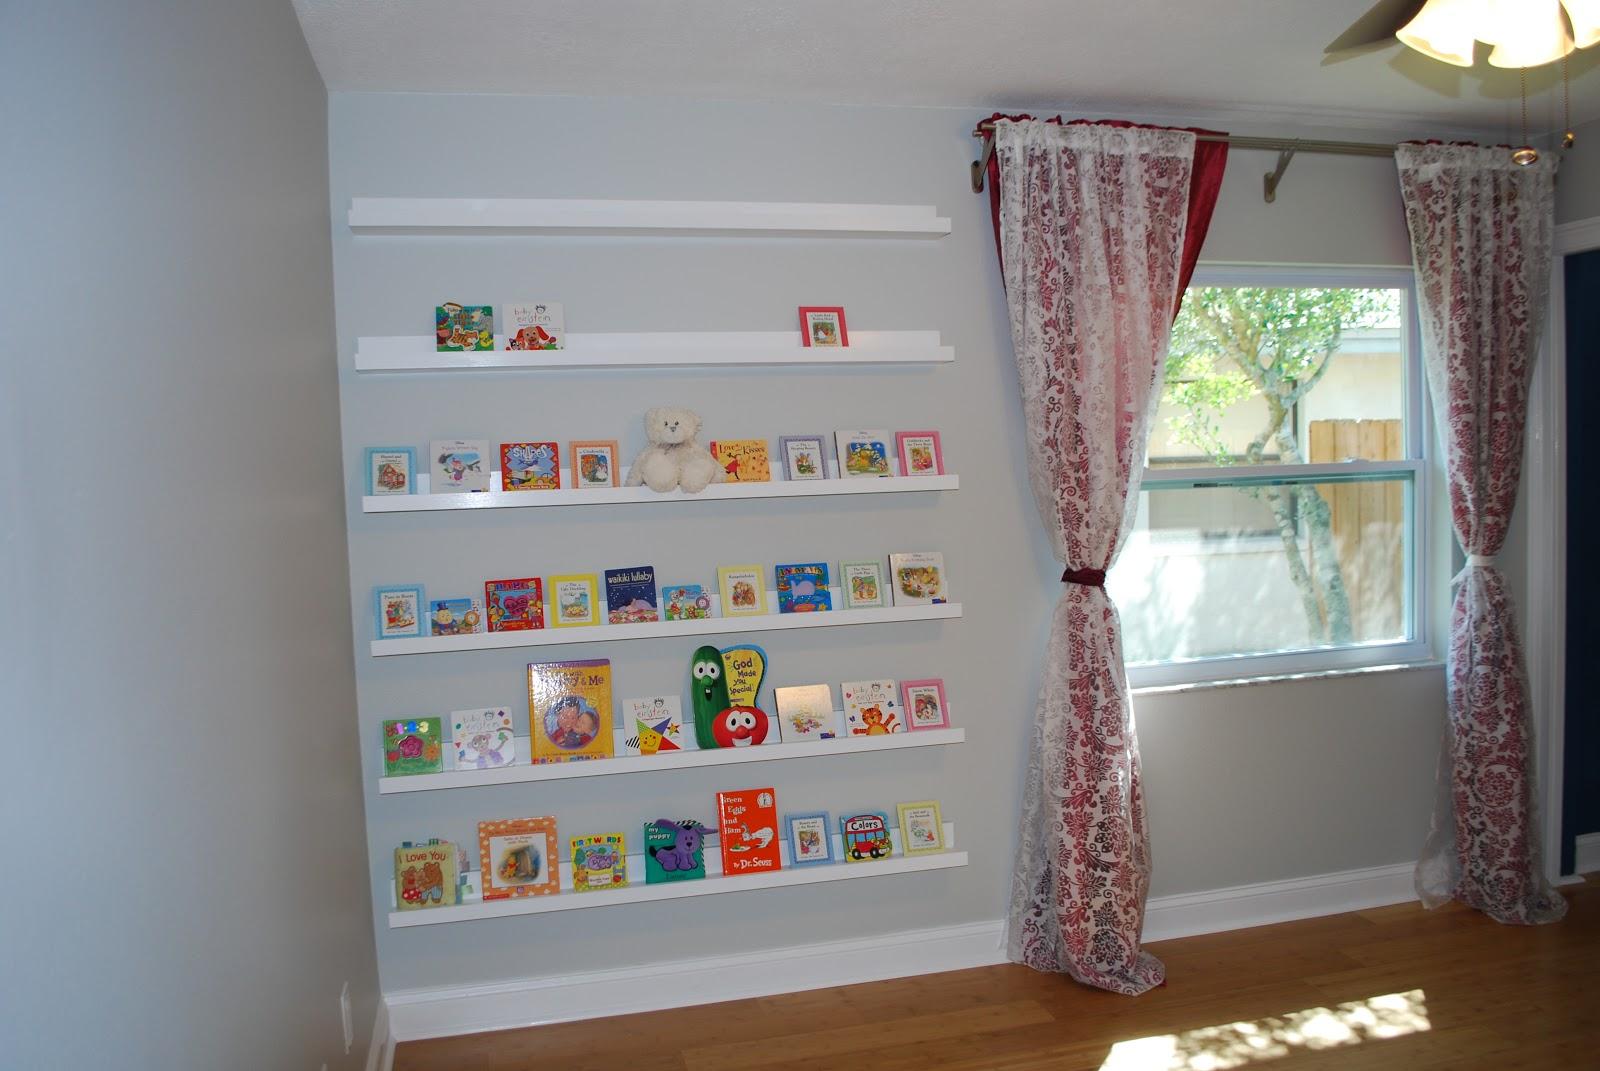 Nursery Room Book Shelves Gallery Ledges